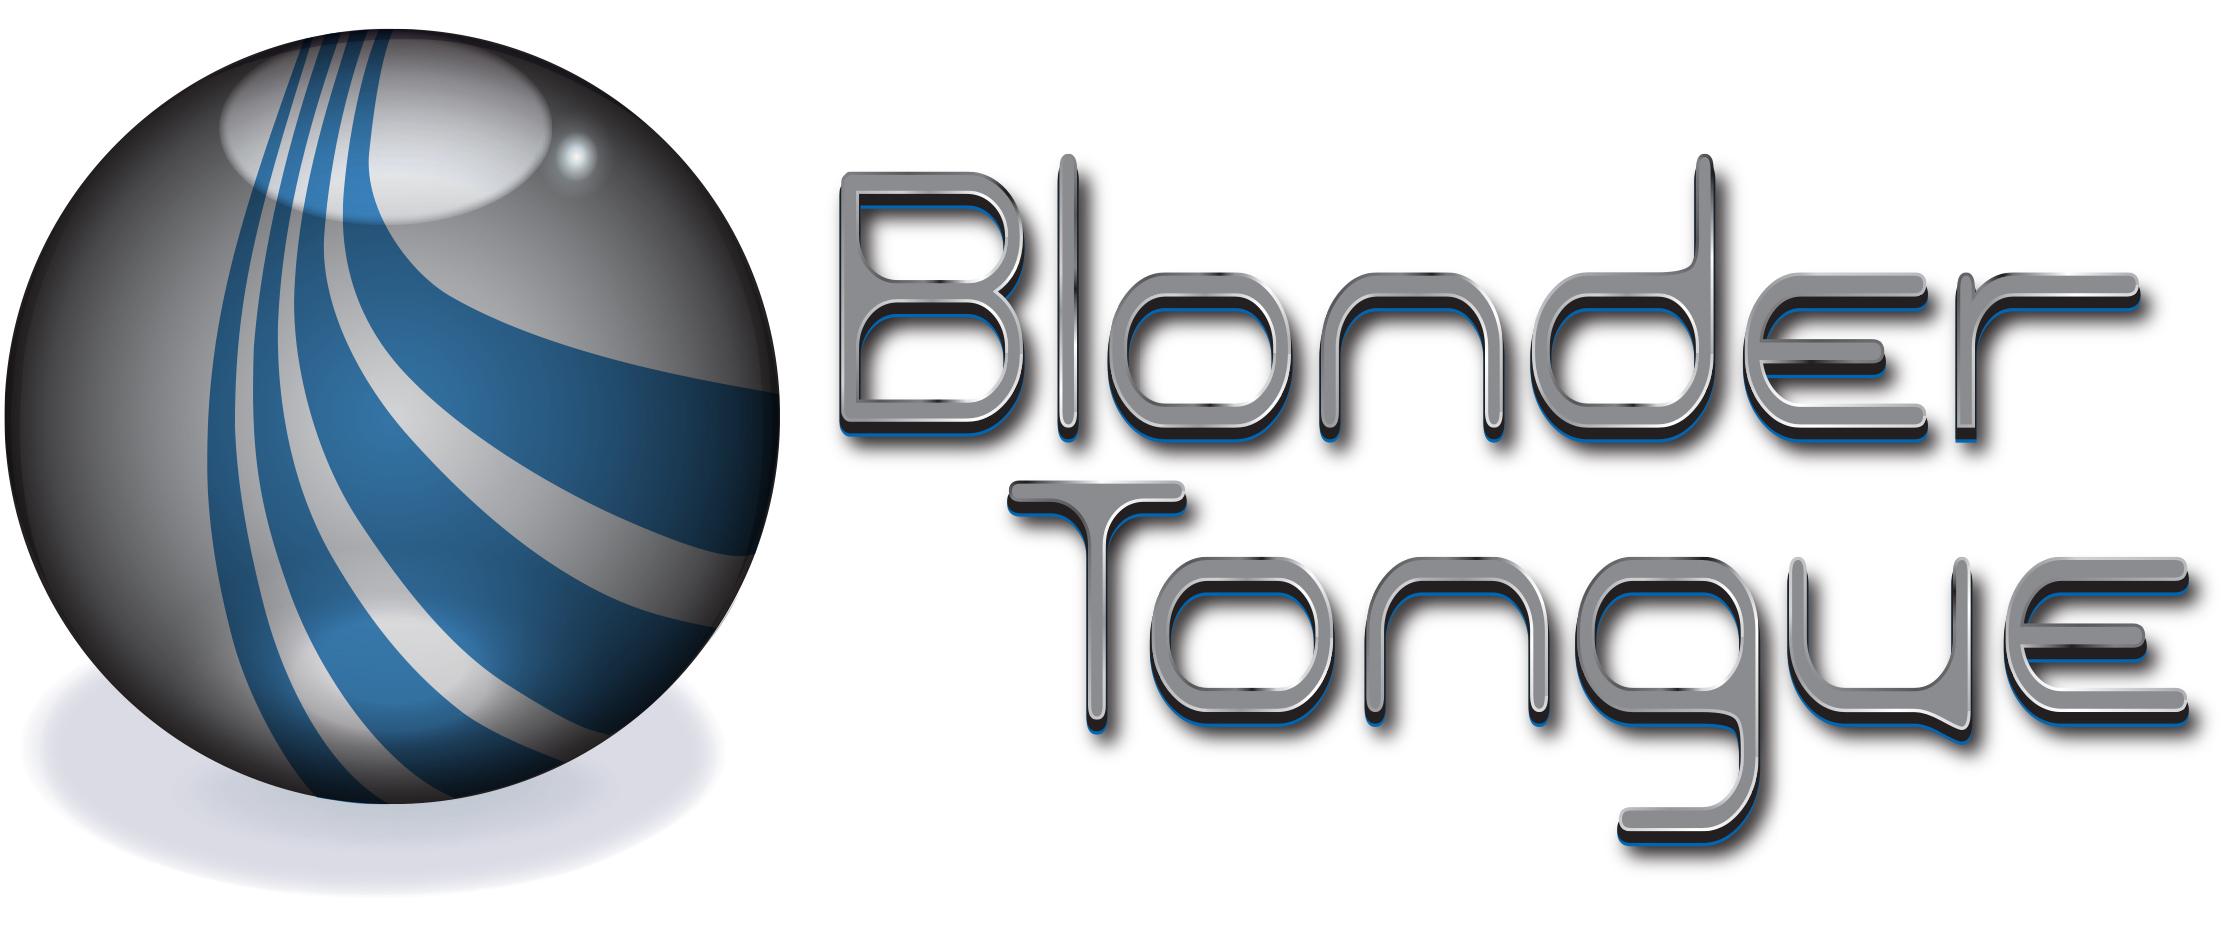 Blonder Tongue Laboratories logo